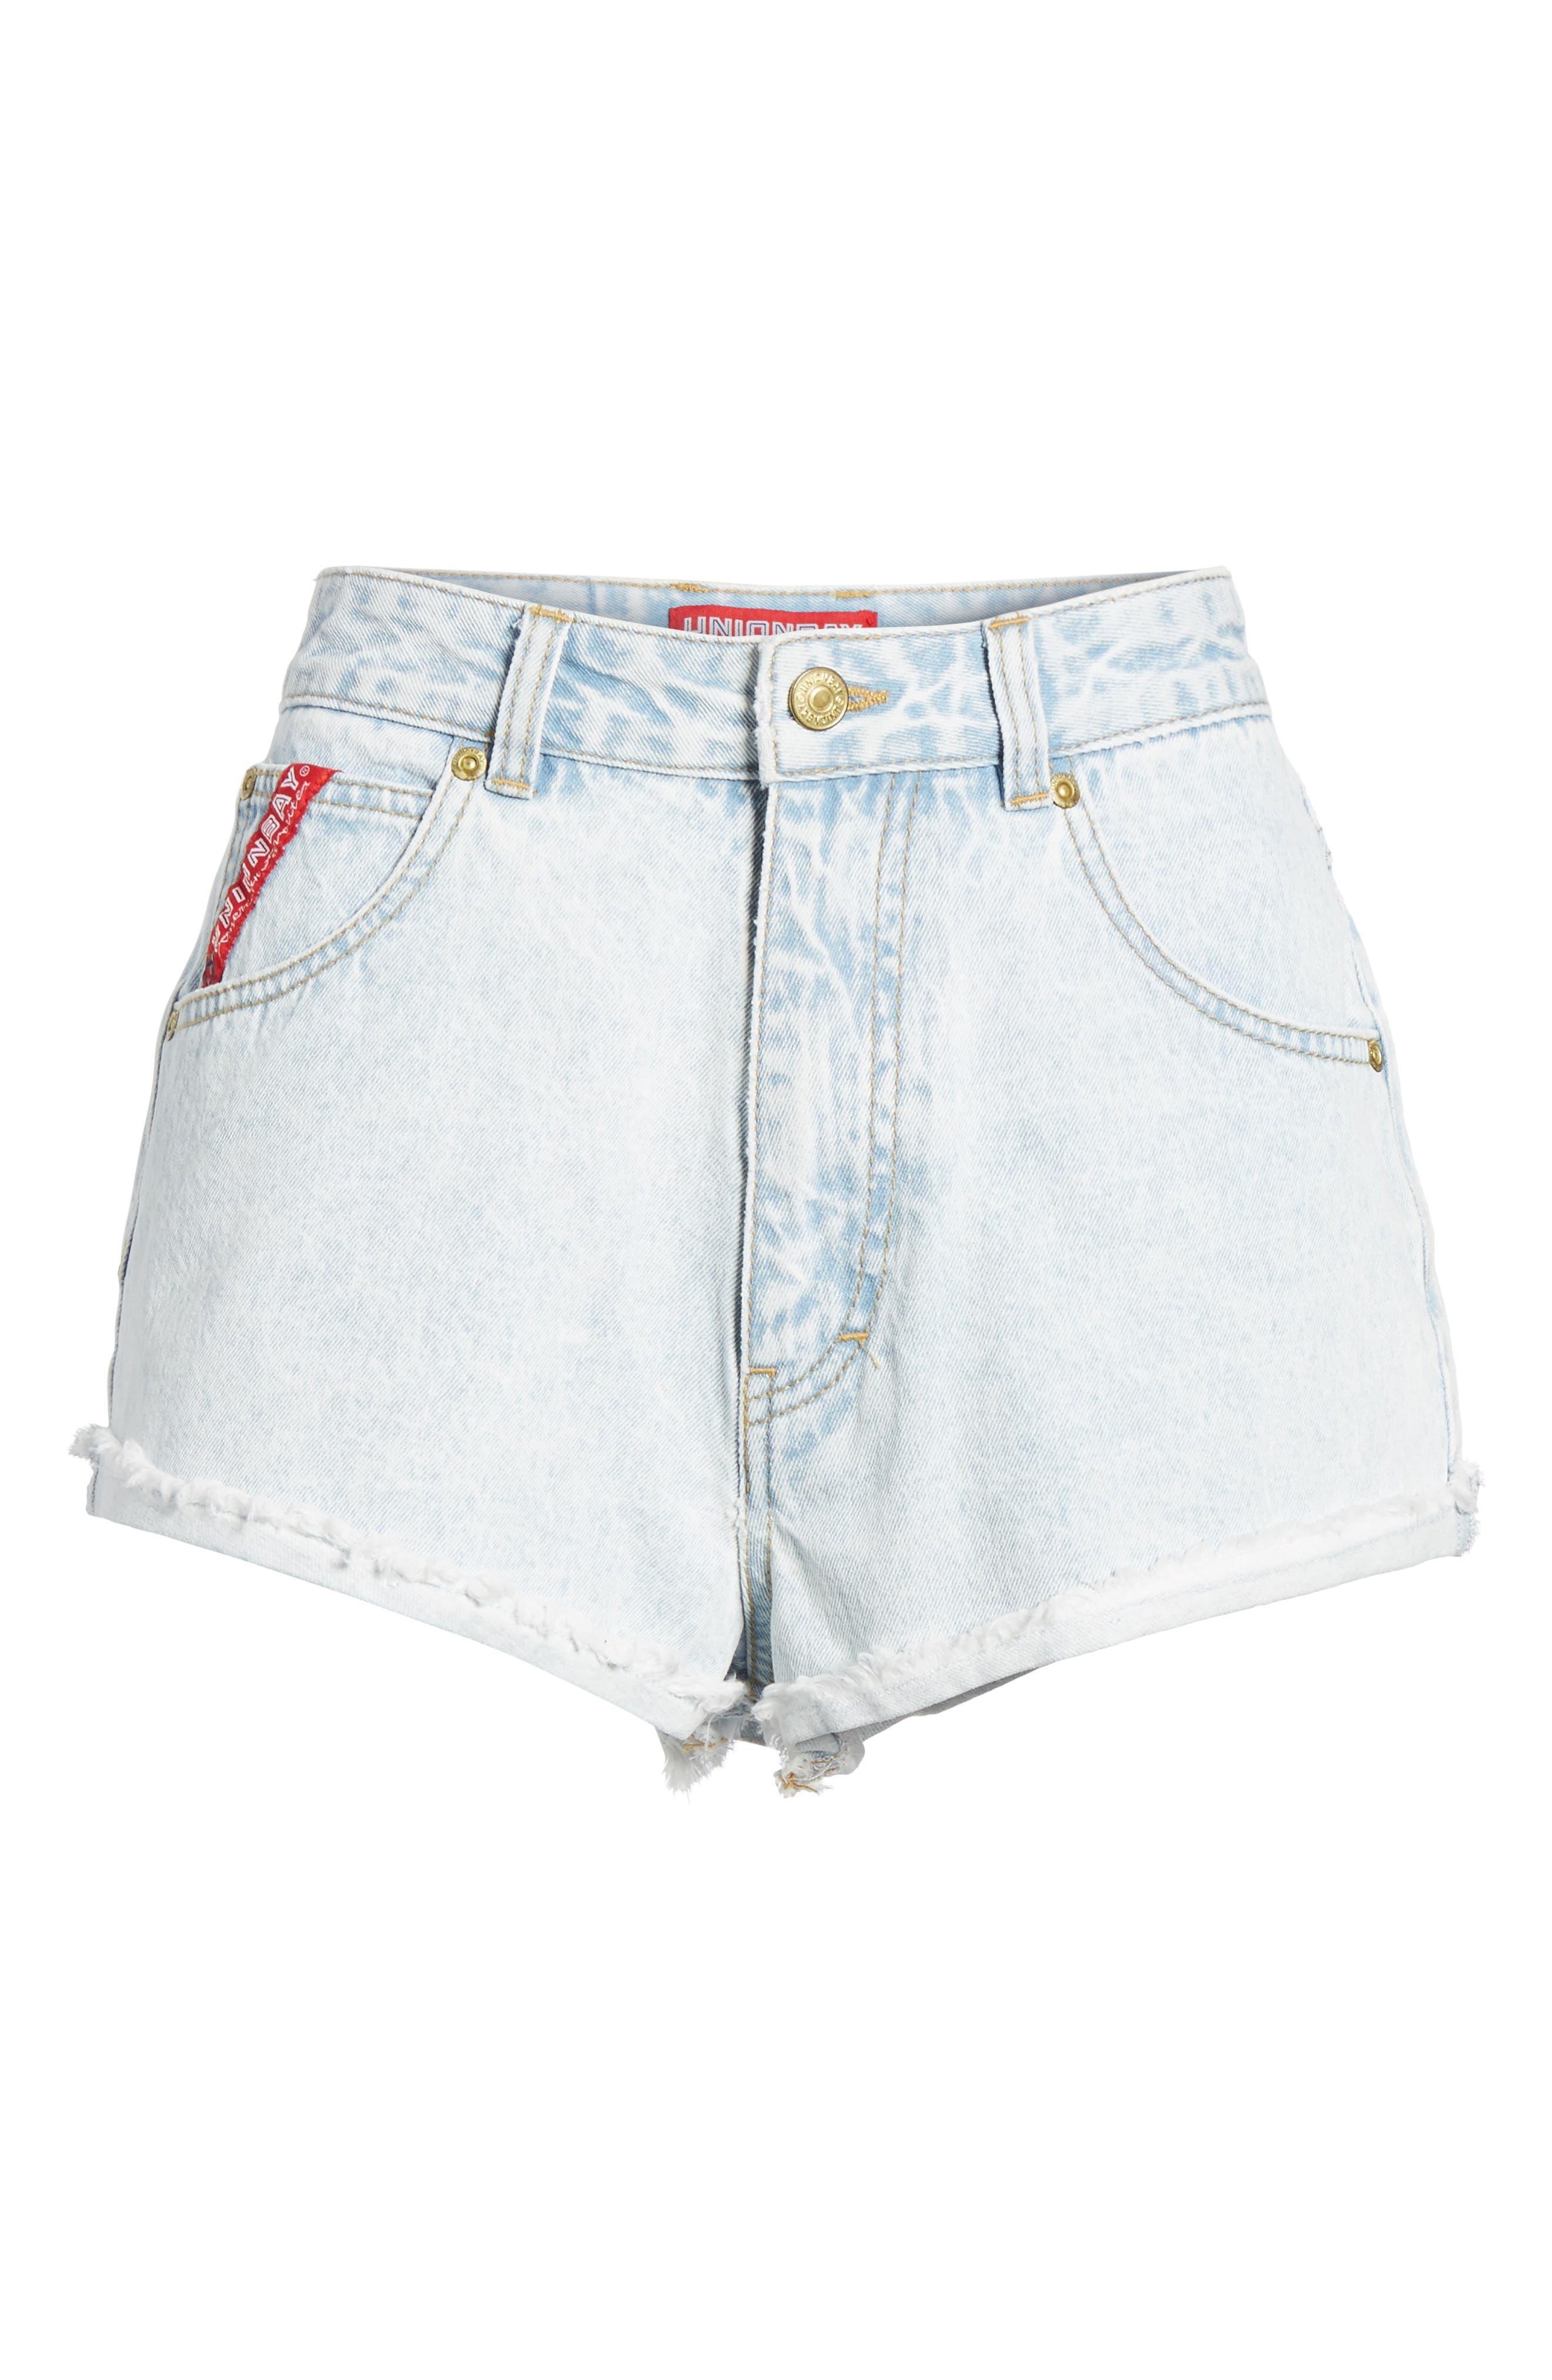 Unionbay Devo Acid Wash Denim Shorts,                             Alternate thumbnail 6, color,                             401